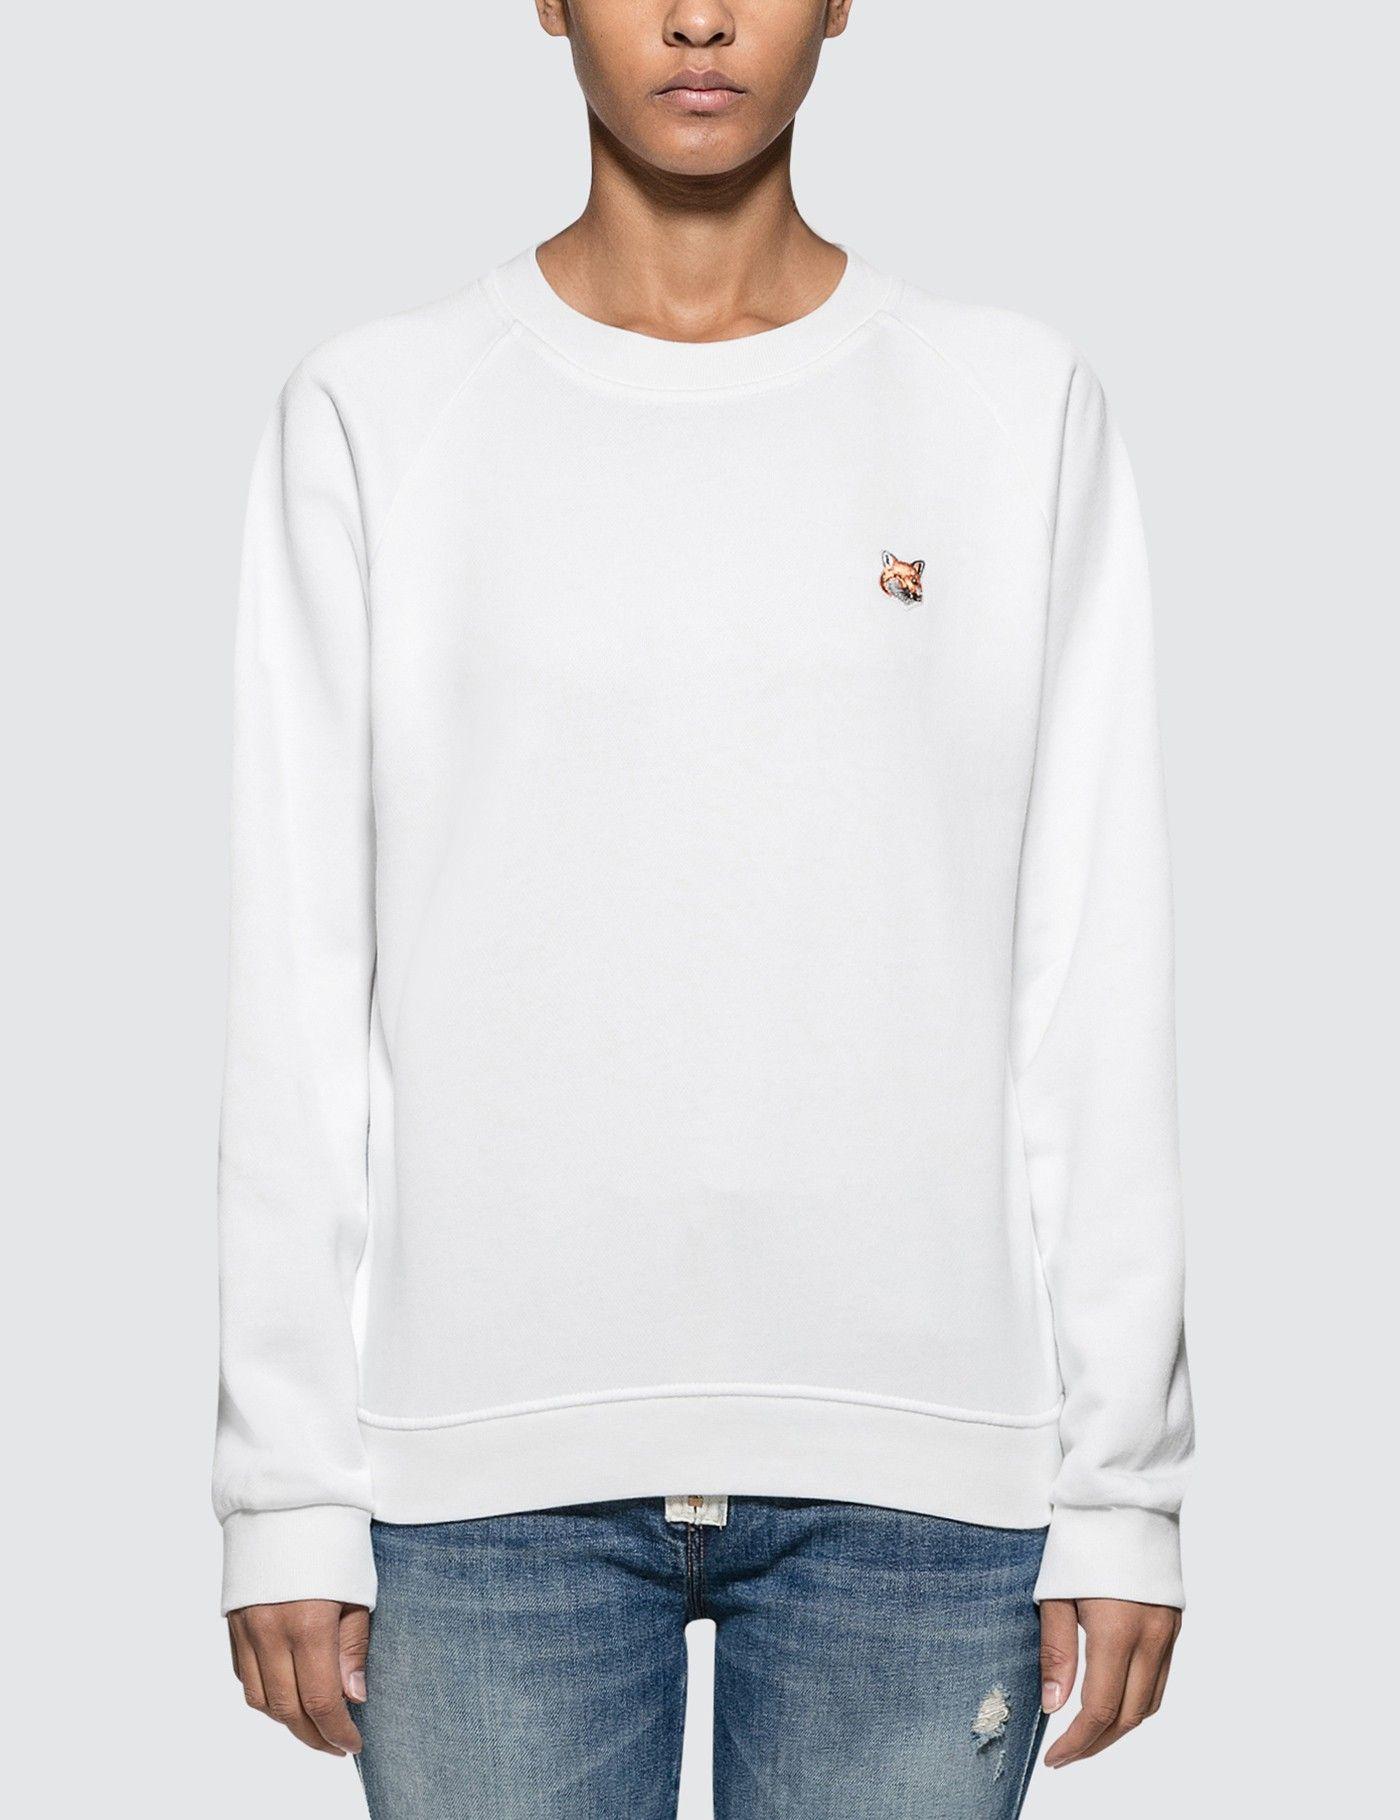 Maison Kitsune Fox Head Patch Sweatshirt Ad Ad Ad Fox Sweatshirt Patch Kitsune Sweatshirts Patch Sweatshirts Maison Kitsune [ 1820 x 1400 Pixel ]